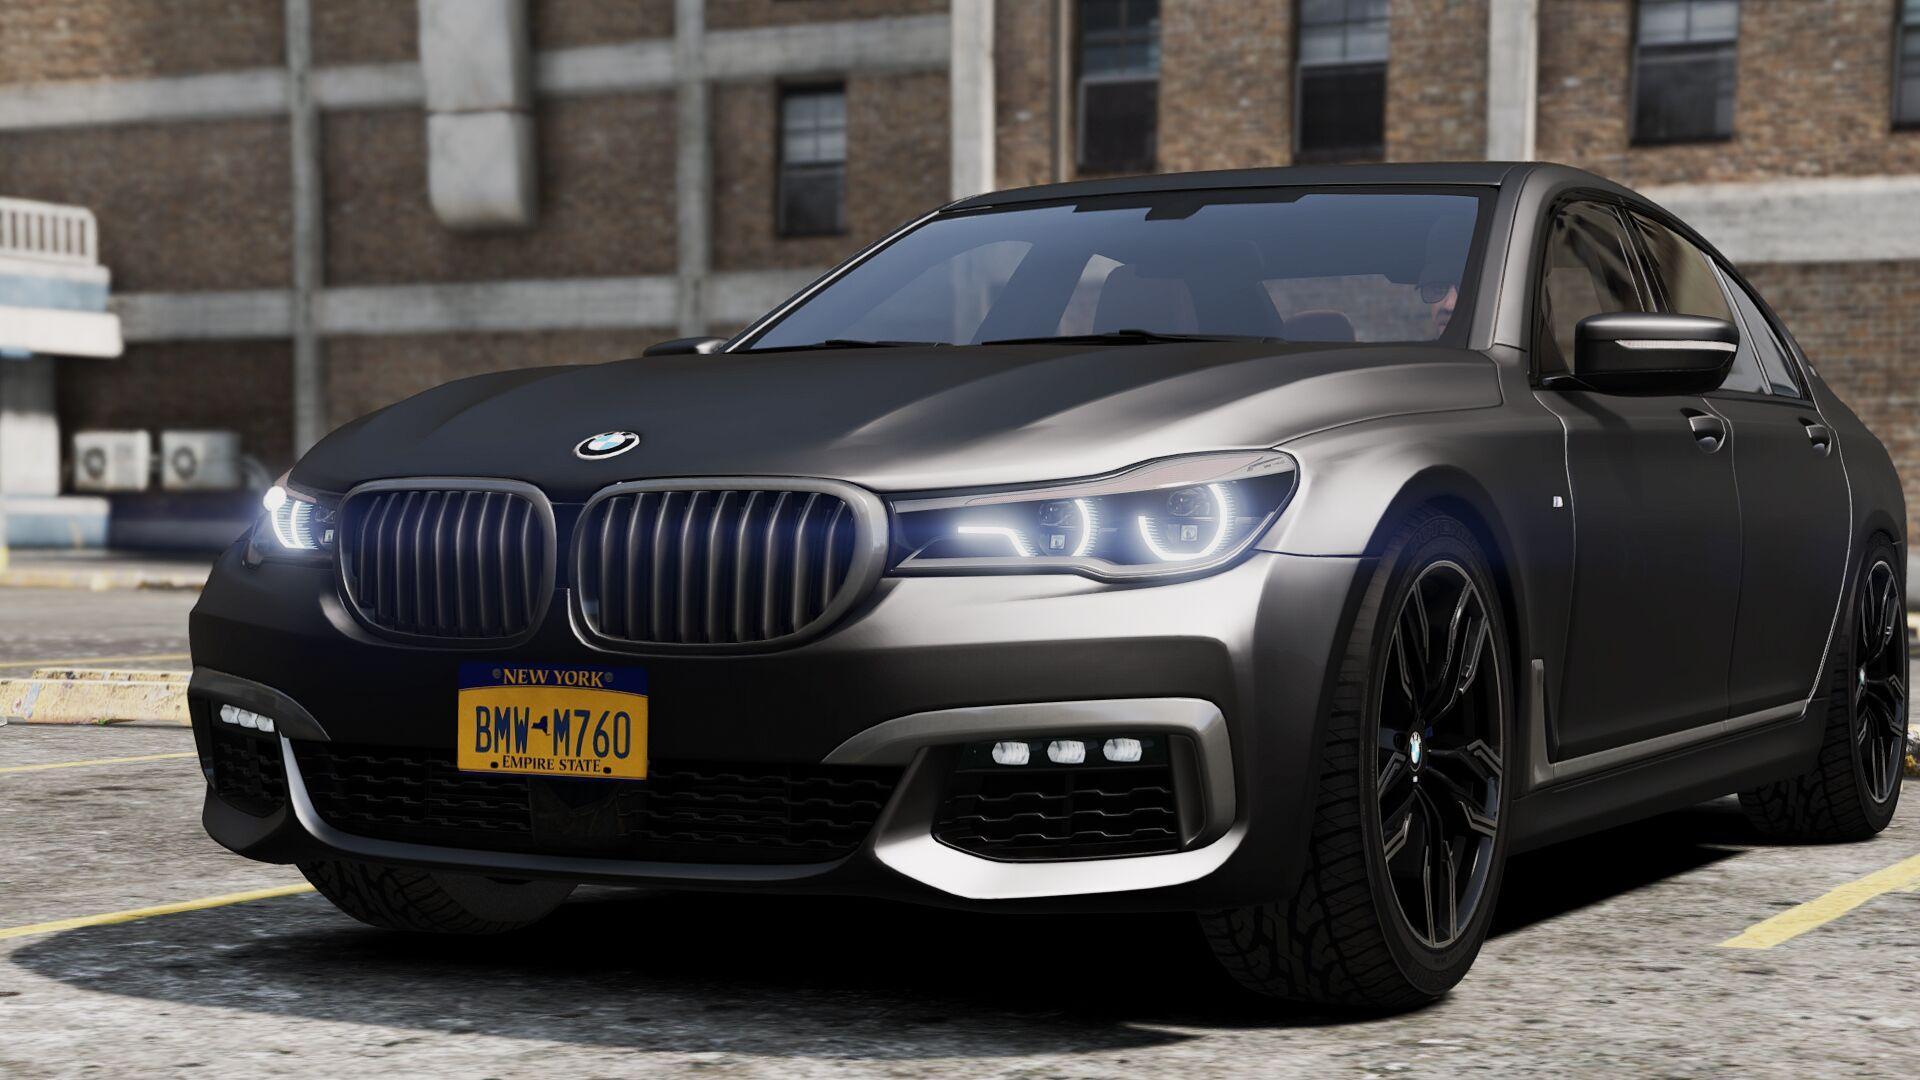 BMW M760i 2017[Add-On / Replace] - GTA5-Mods.com